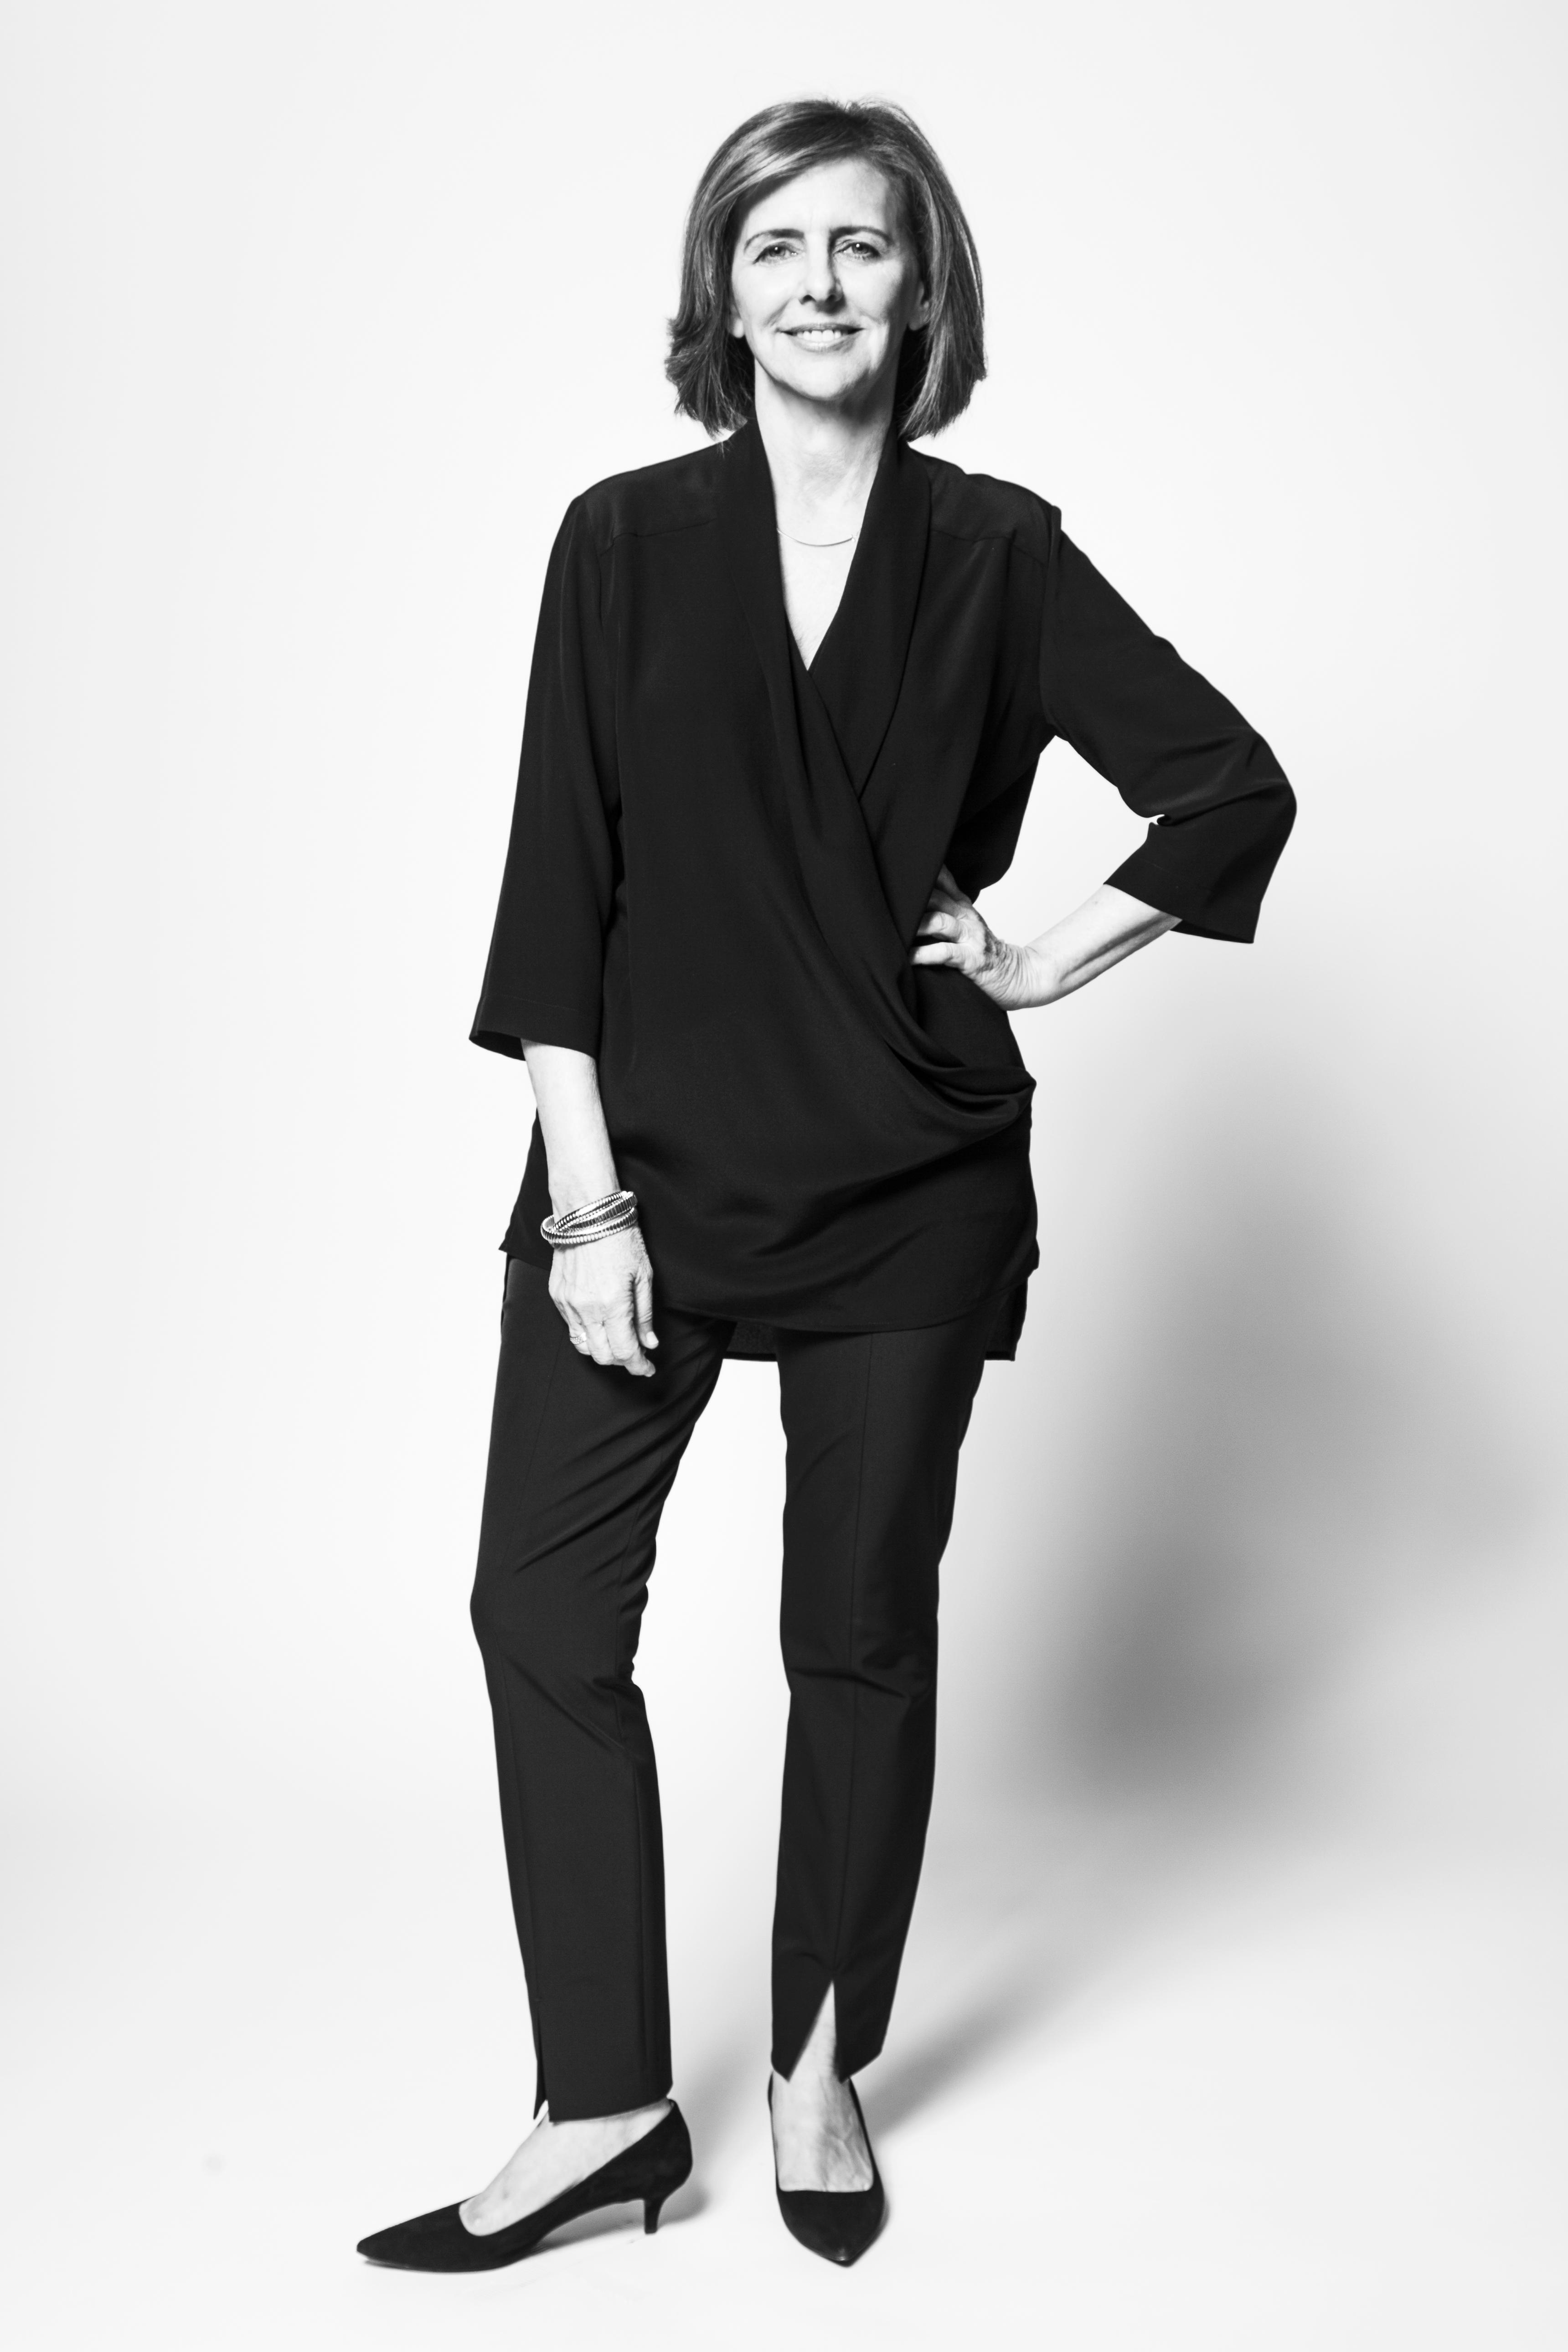 Nancy Meyers, director of The Intern